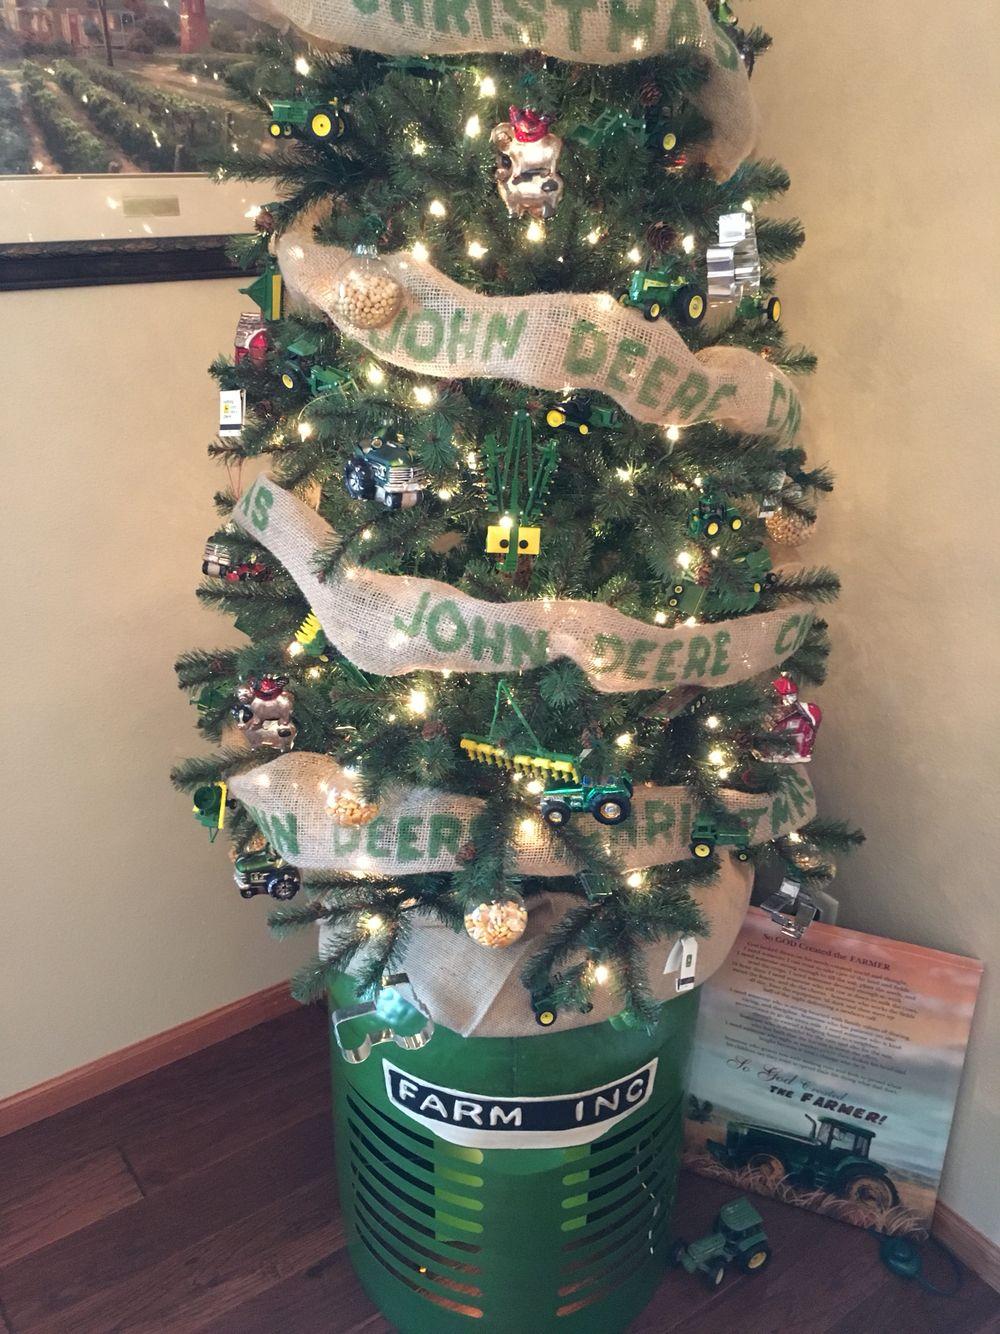 John Deere Christmas Tree   Crafts   Pinterest   Christmas tree ...